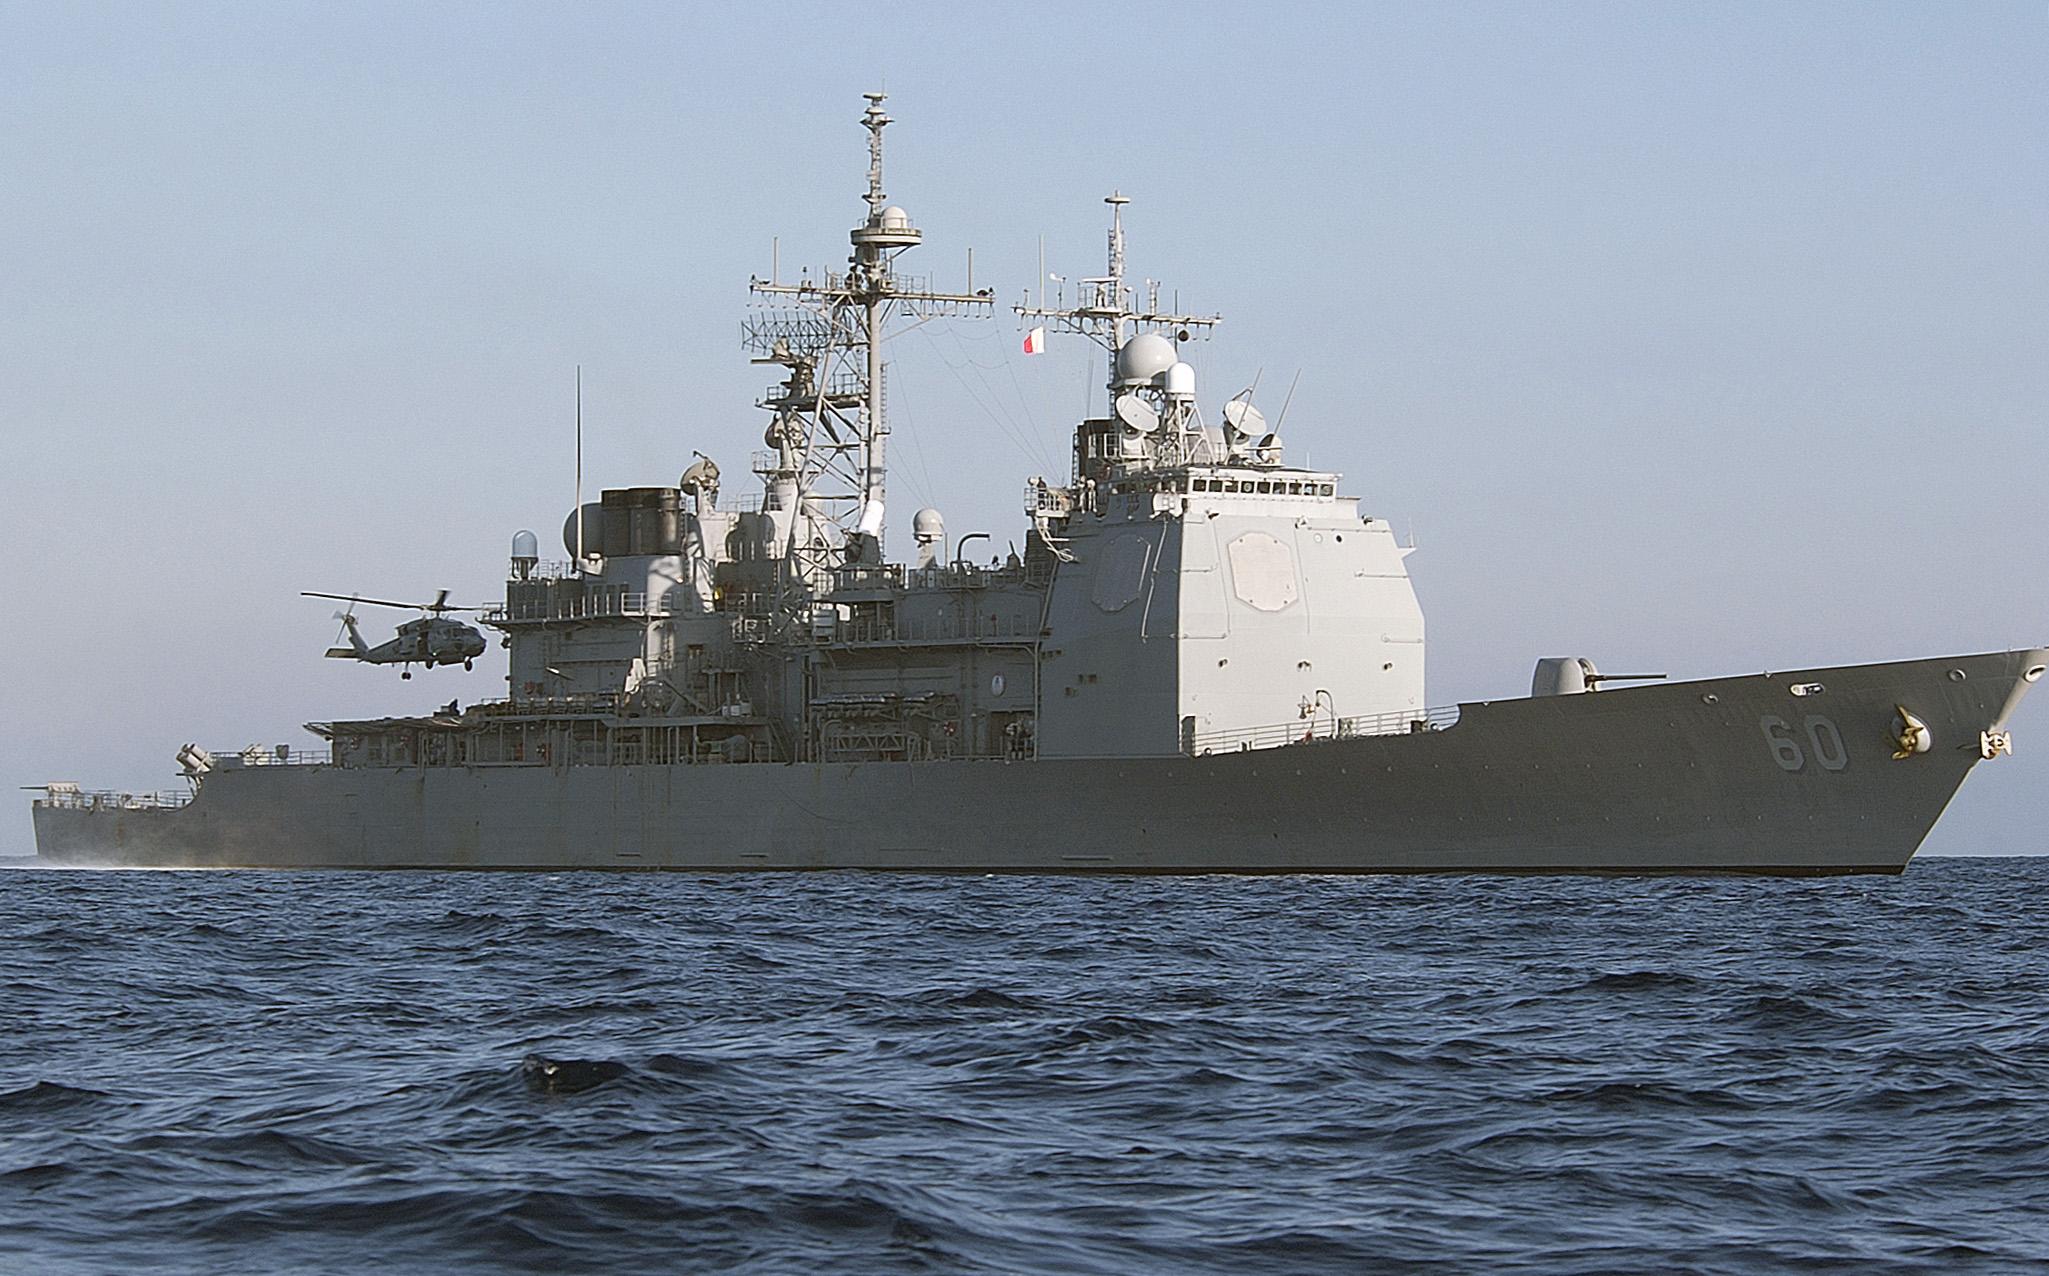 http://upload.wikimedia.org/wikipedia/commons/5/58/USS_Normandy_CG-60.jpg